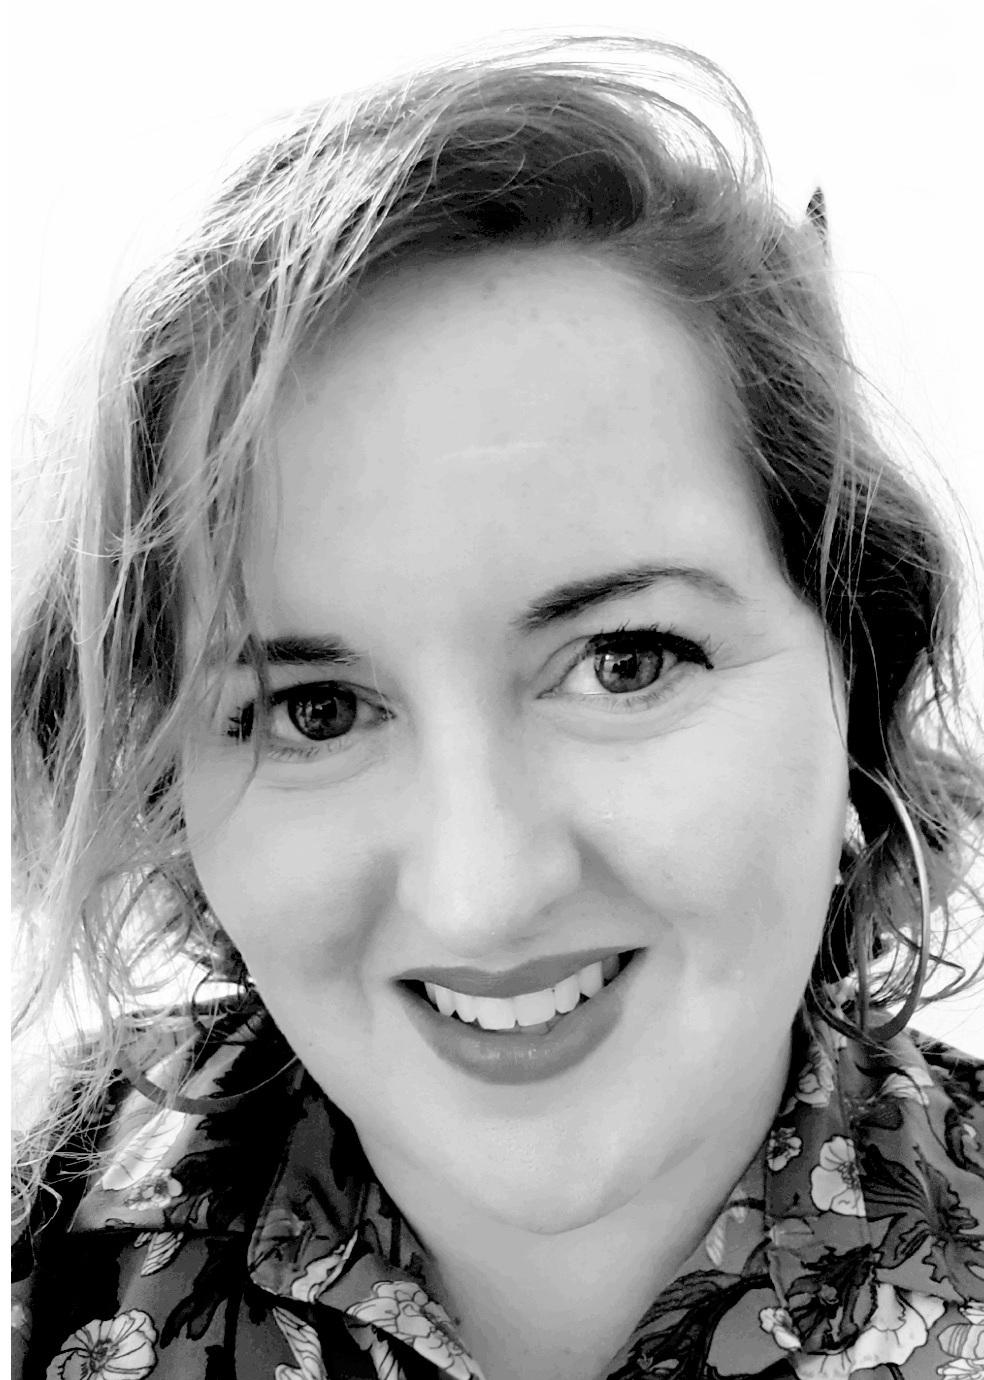 Nuala McClarenFringe Coordinator & Alley Gallery Curator - Reader Services Librarian at Goldsmiths University